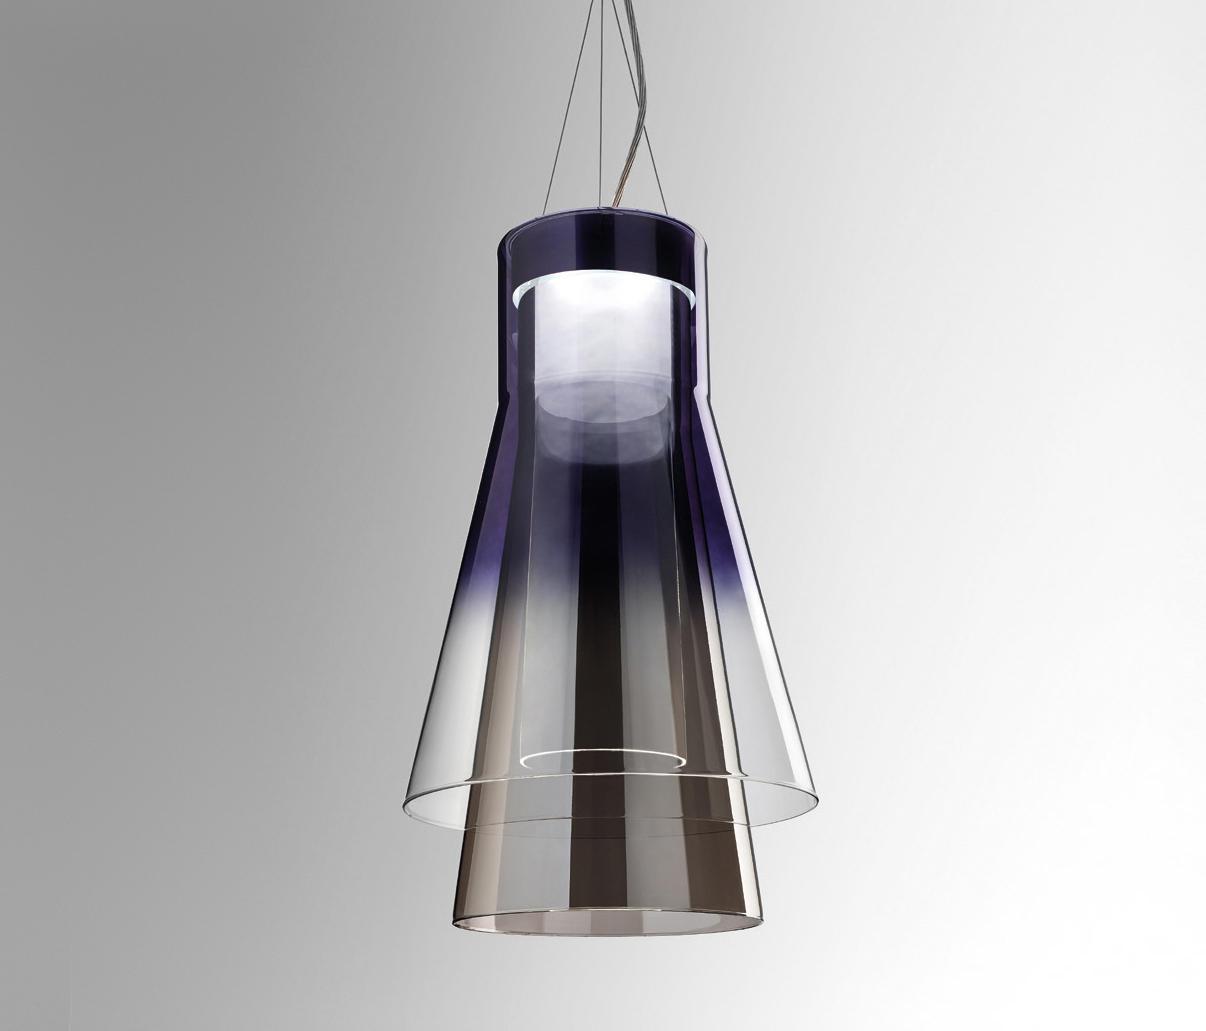 Trigona S Black And Grey By Leucos Usa Suspended Lights